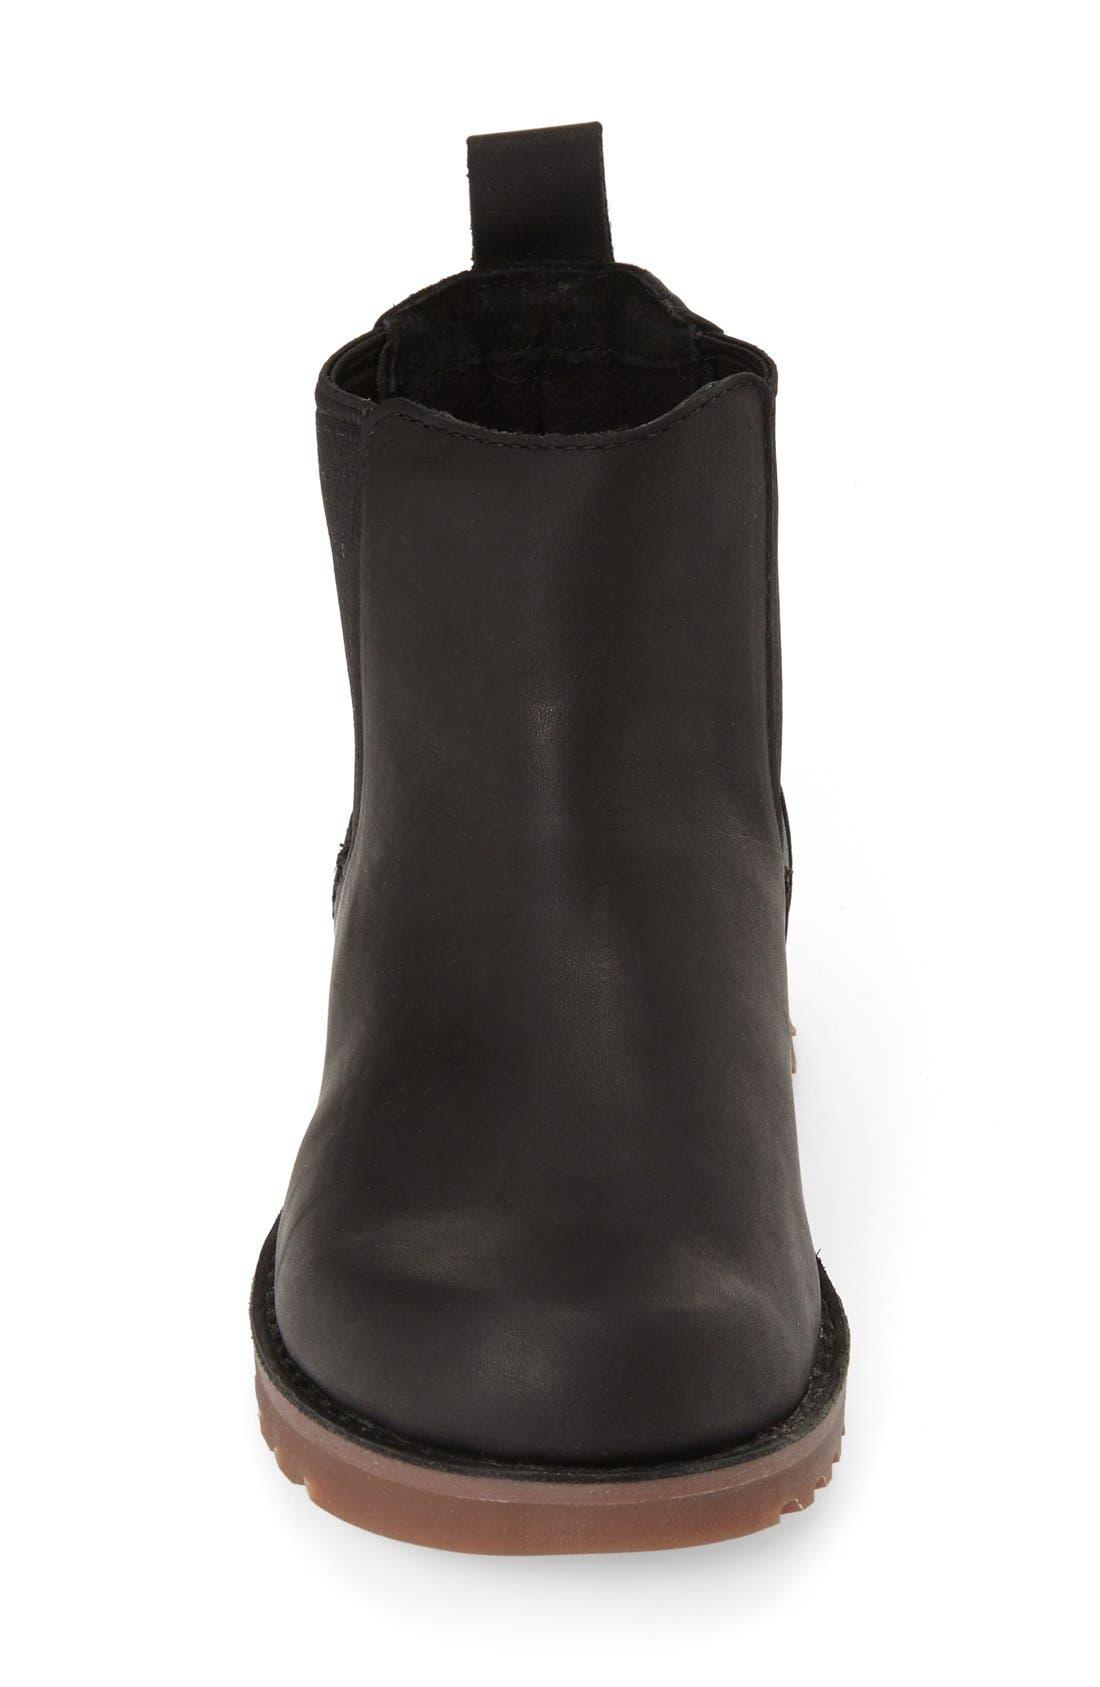 Alternate Image 3  - UGG® Callum Water Resistant Chelsea Boot (Walker, Toddler, Little Kid & Big Kid)